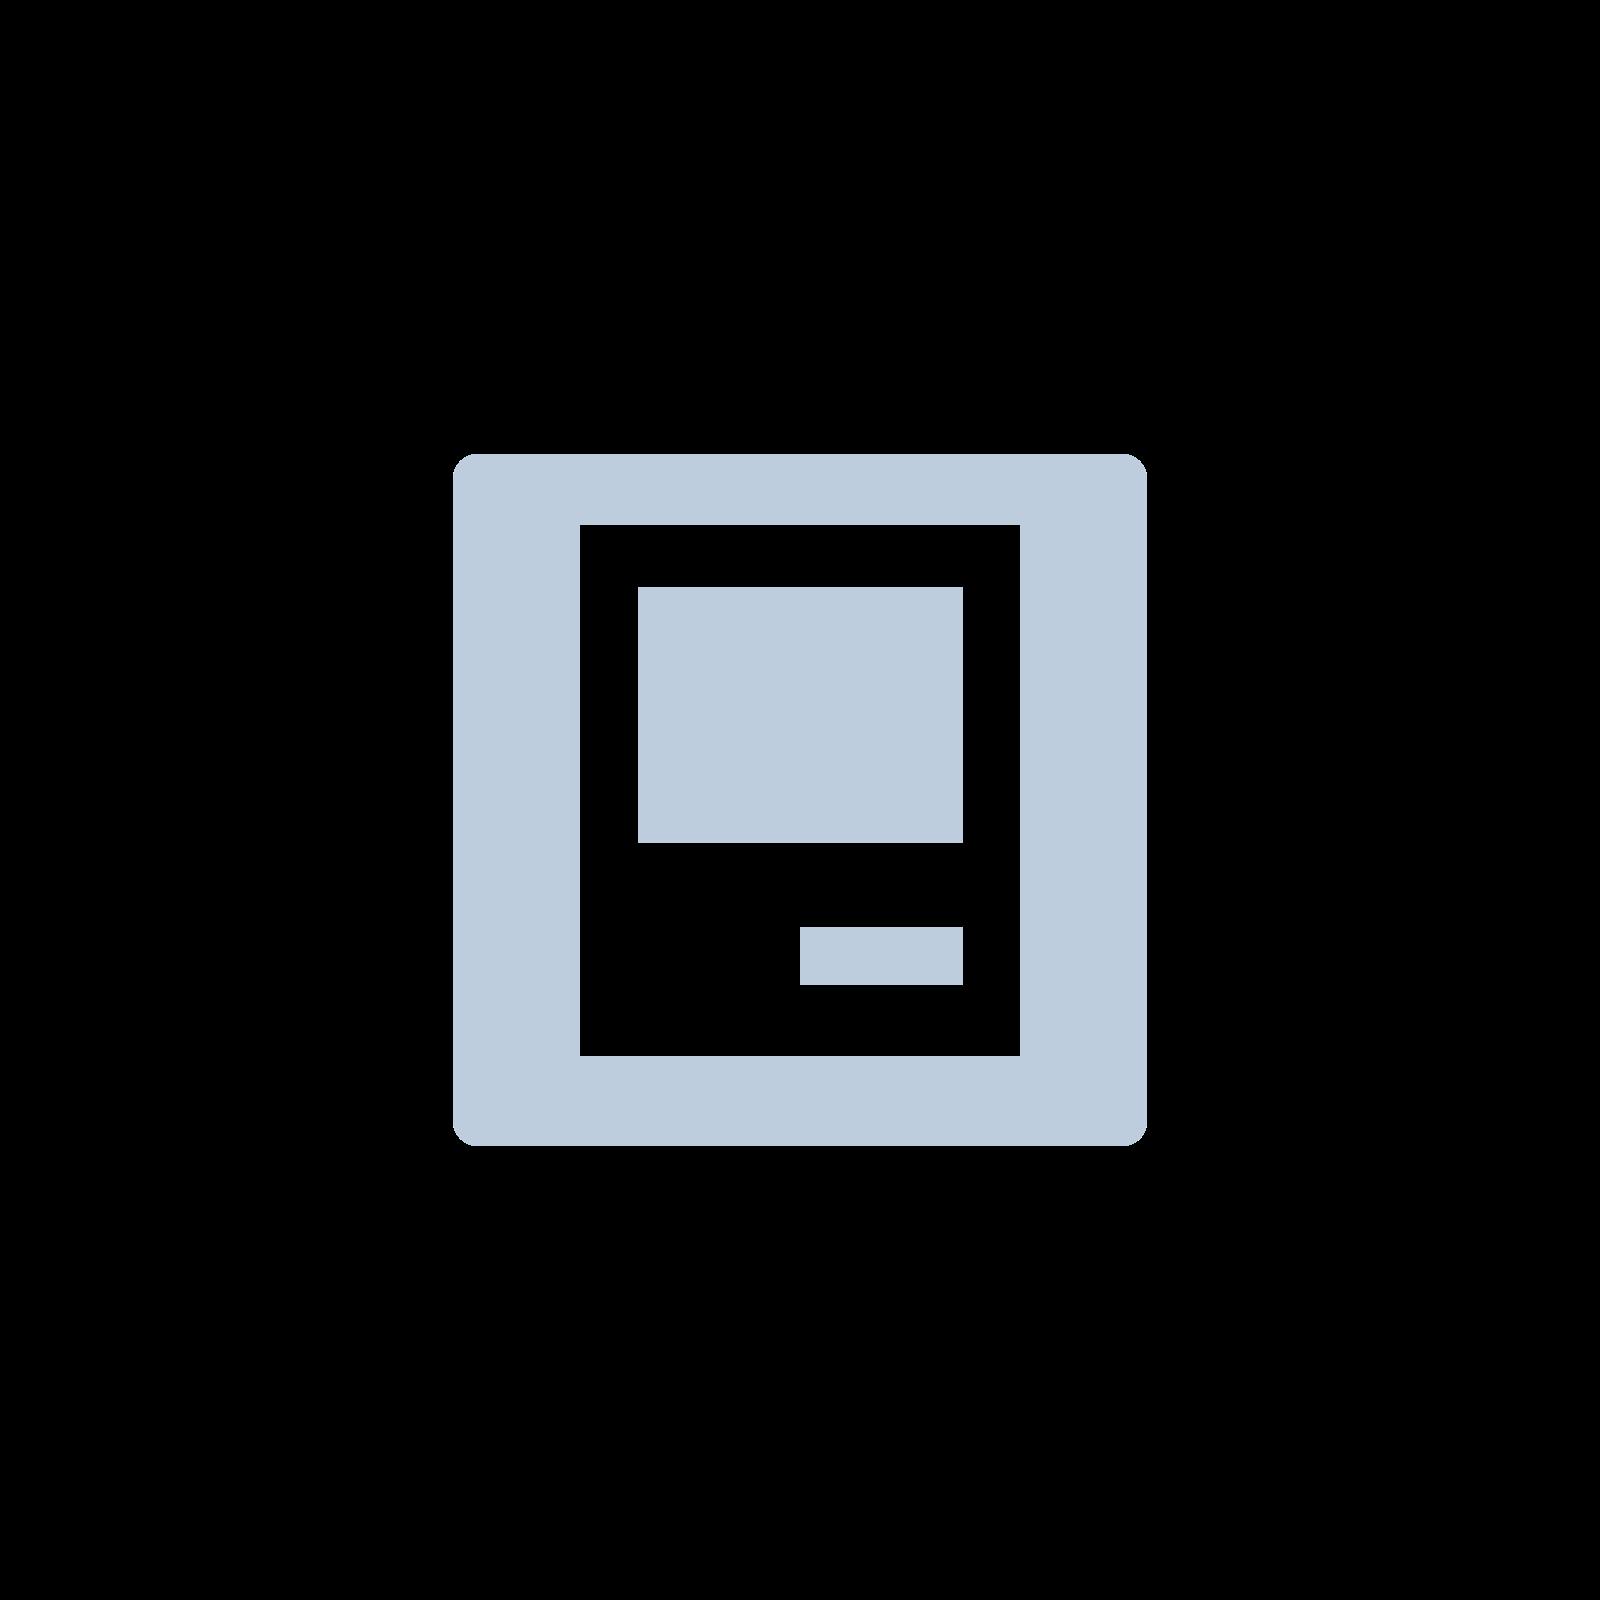 iPad mini 16GB Wi-Fi + Cellular Space Grau